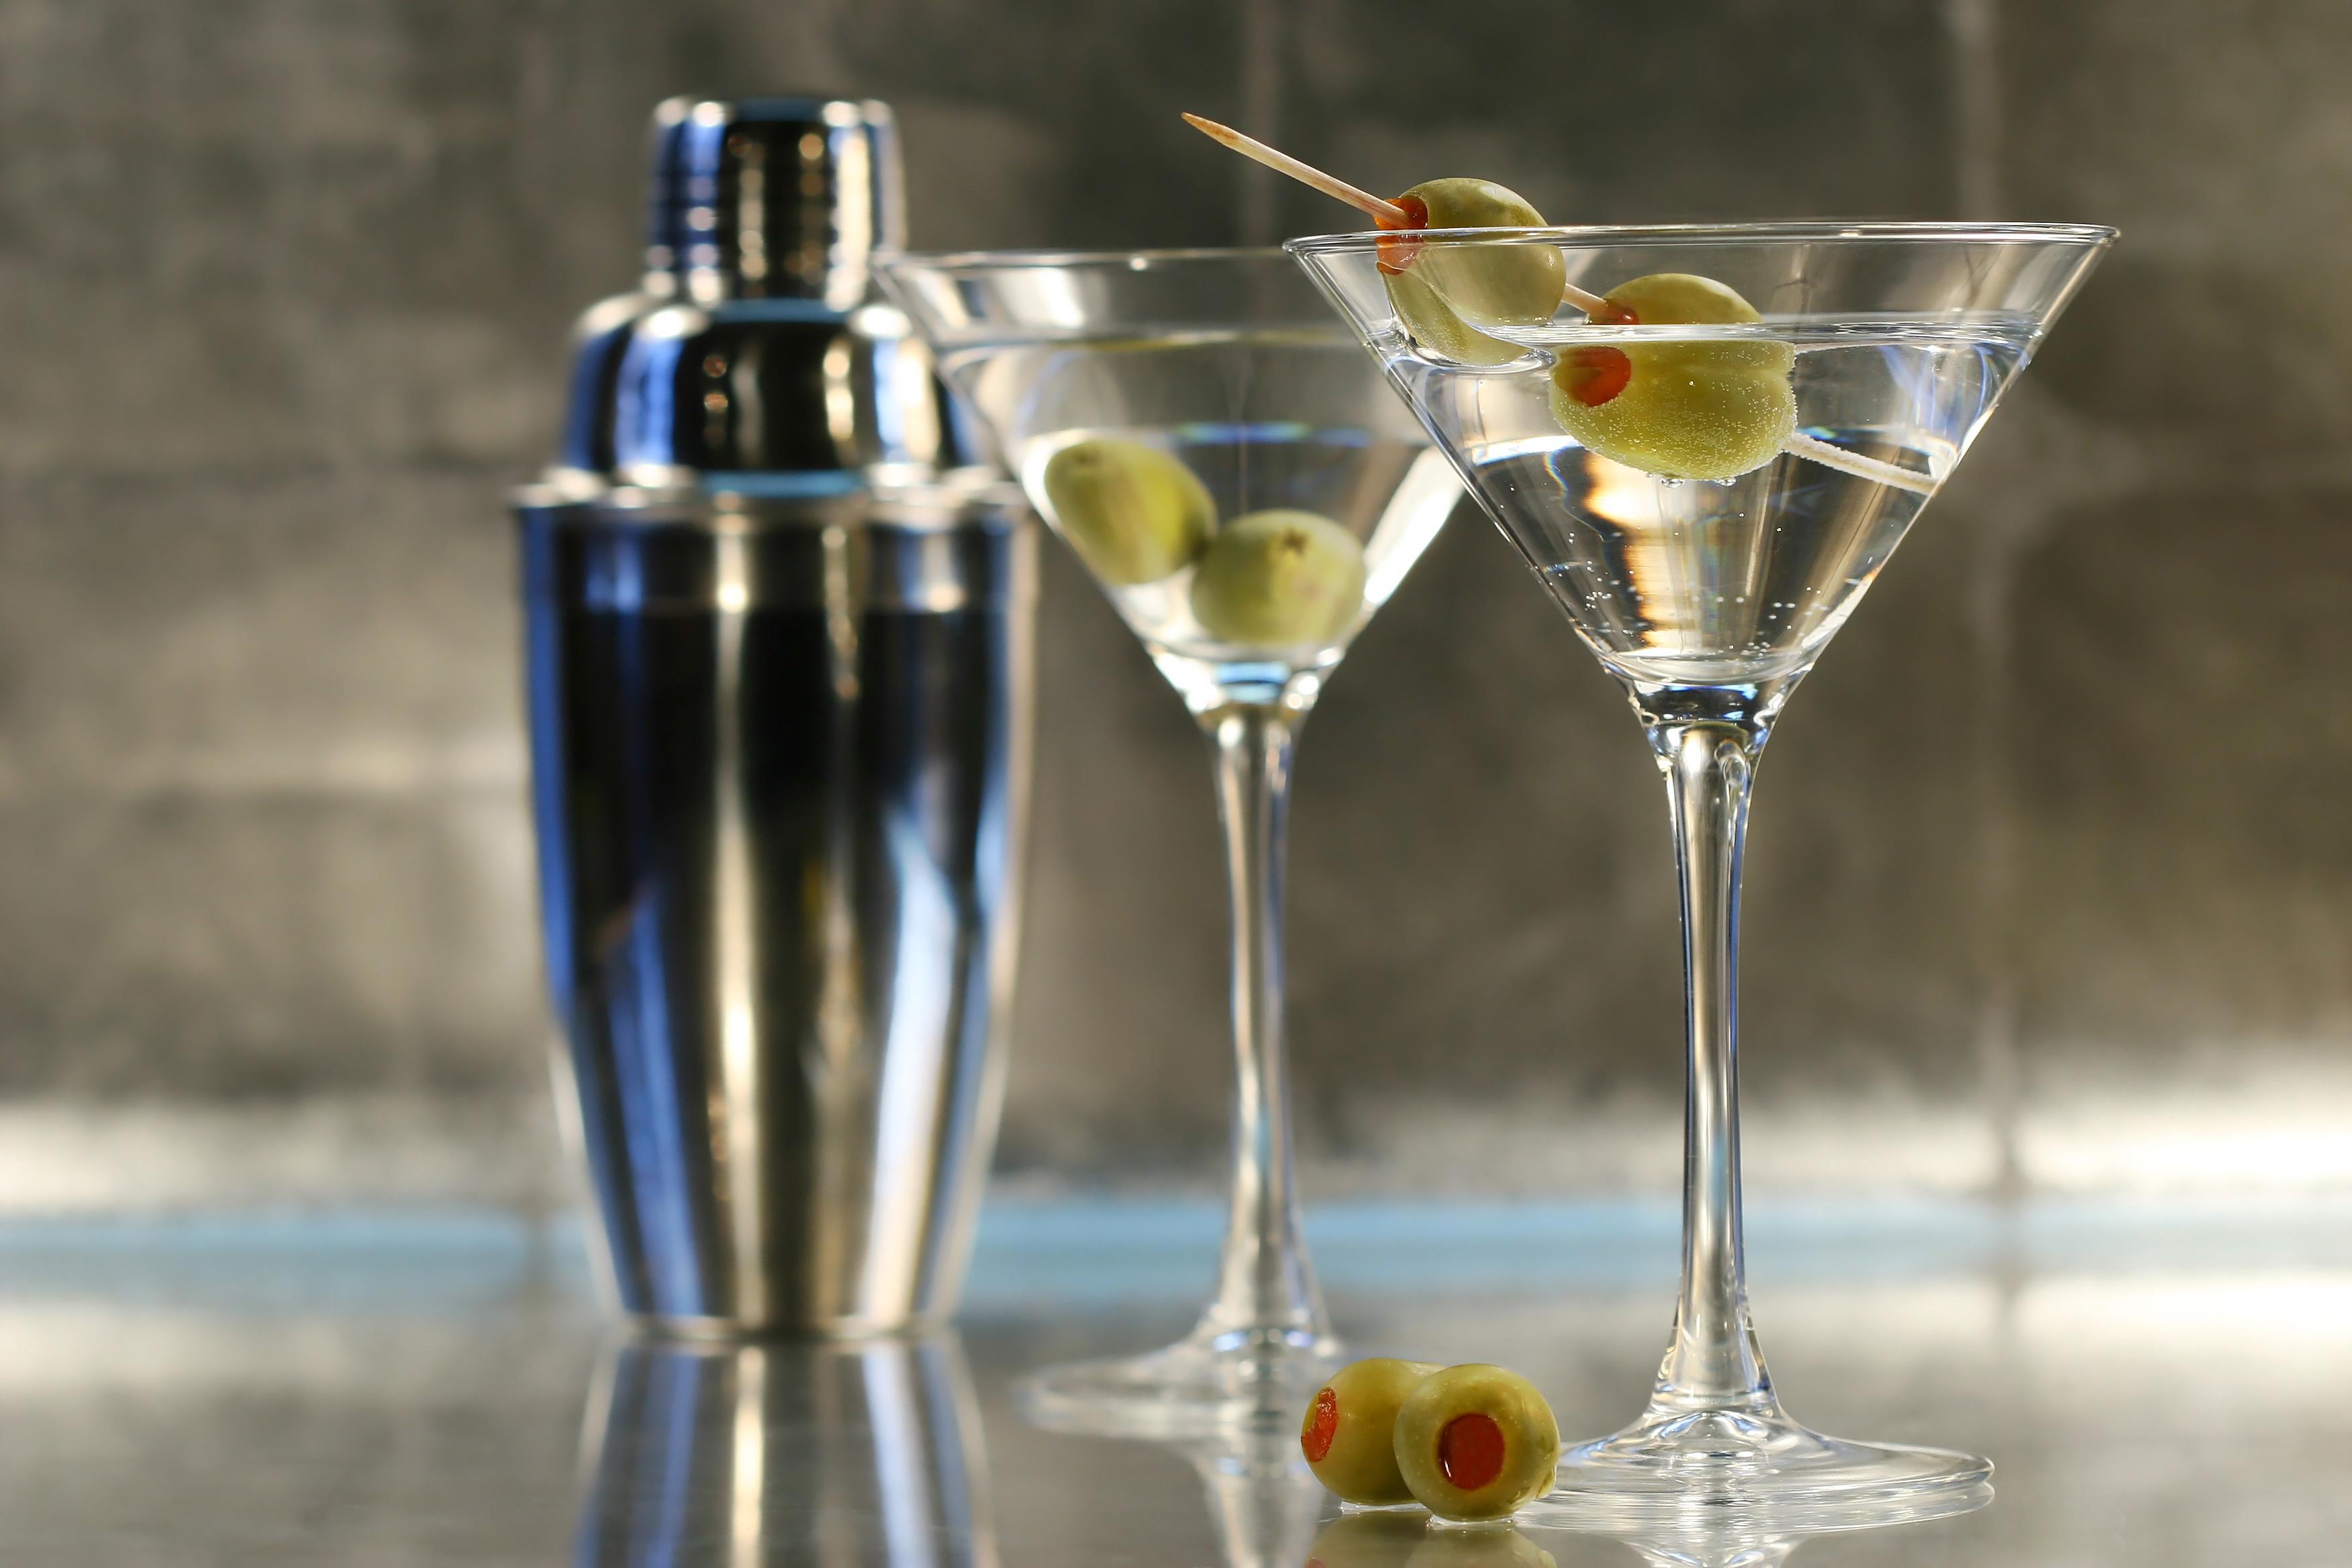 Martini Style Shaken Not Stirred